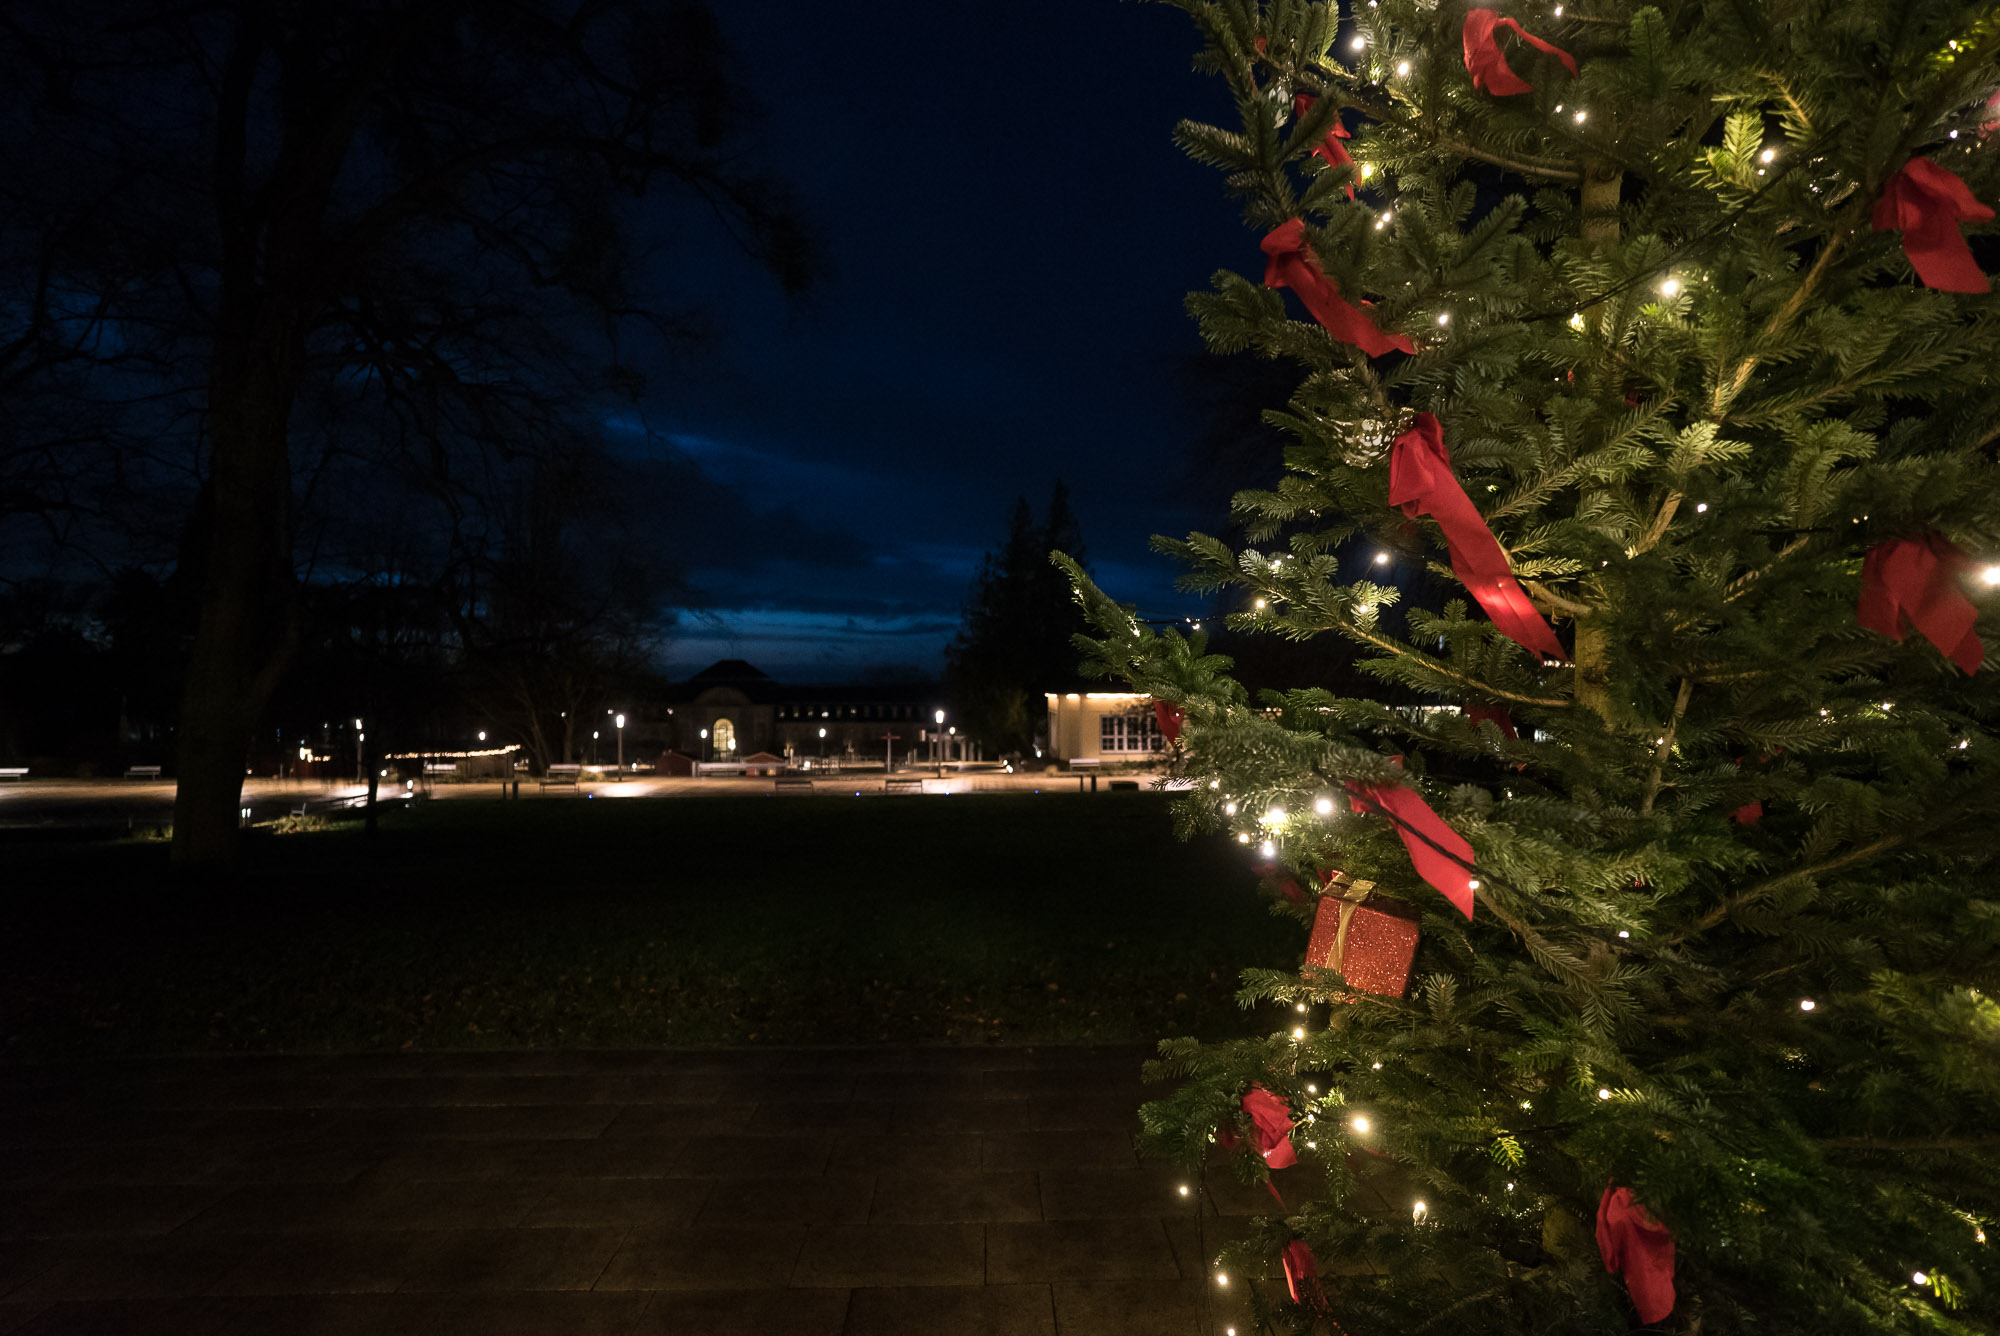 Christmas tree in Bad Nenndorf